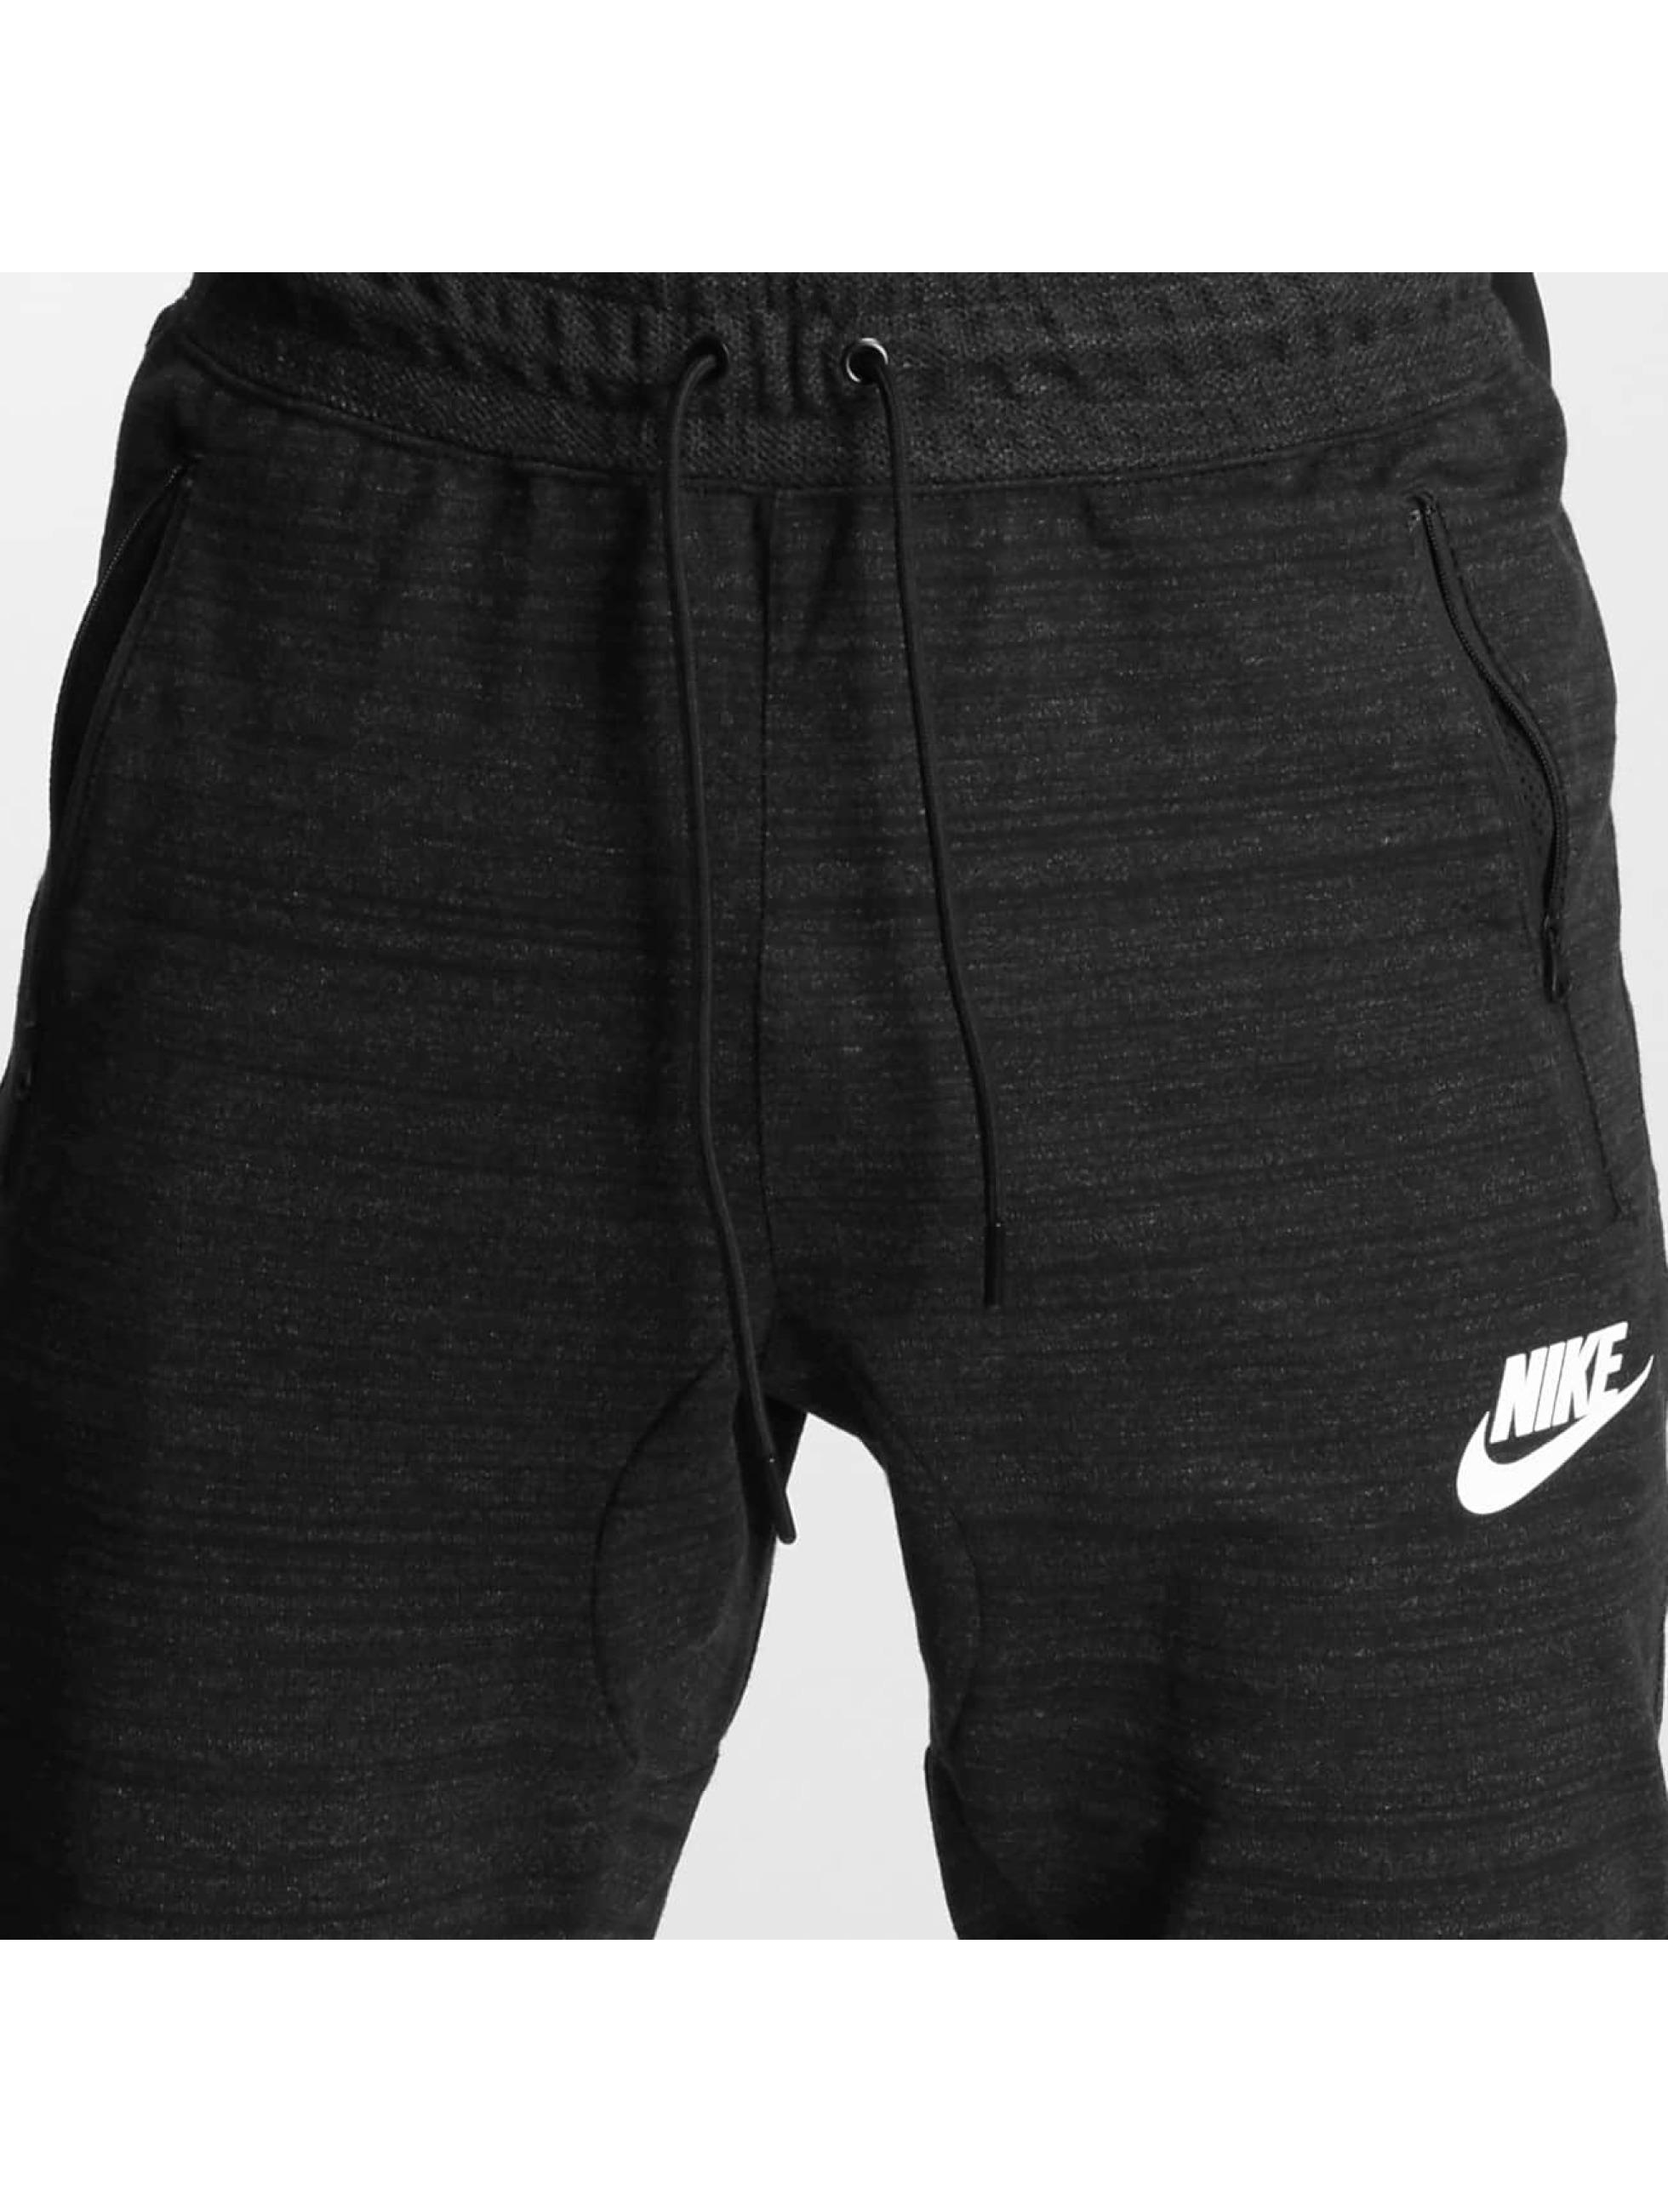 Nike Sweat Pant Sportswear Advance 15 Jogger black